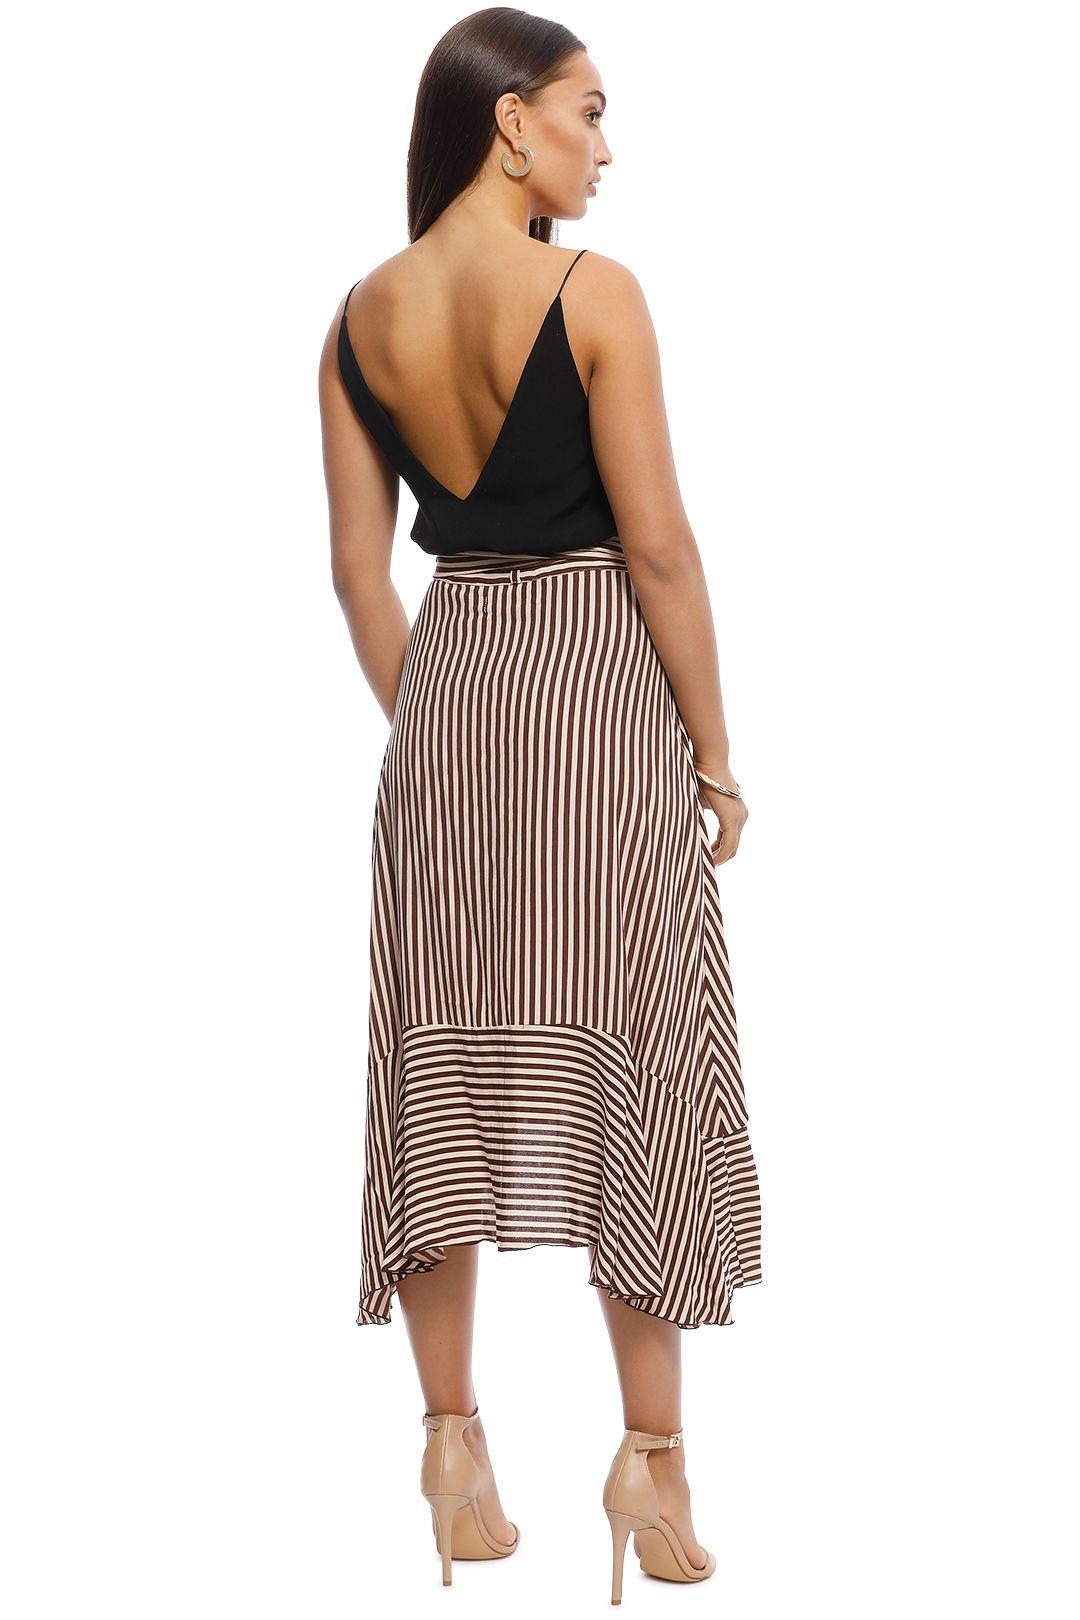 Faithfull - Tramonti Skirt - Georgia Stripe Espresso - Back